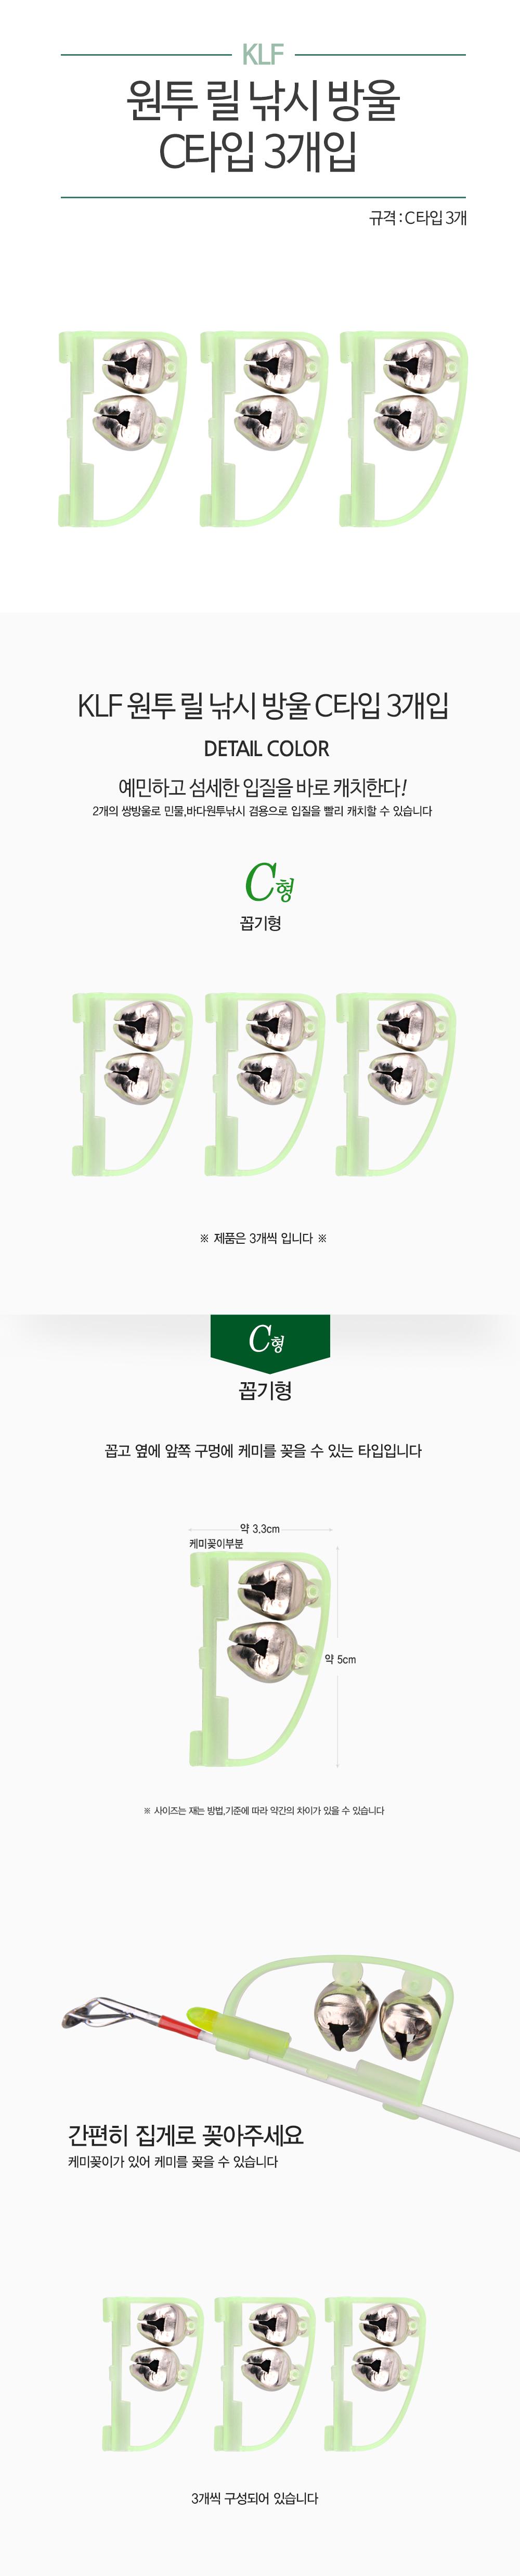 KLF 원투 릴 낚시 방울 C타입 3개입 릴방울 원투낚시방울 릴낚시방울 초릿대방울 방울 딸랑이